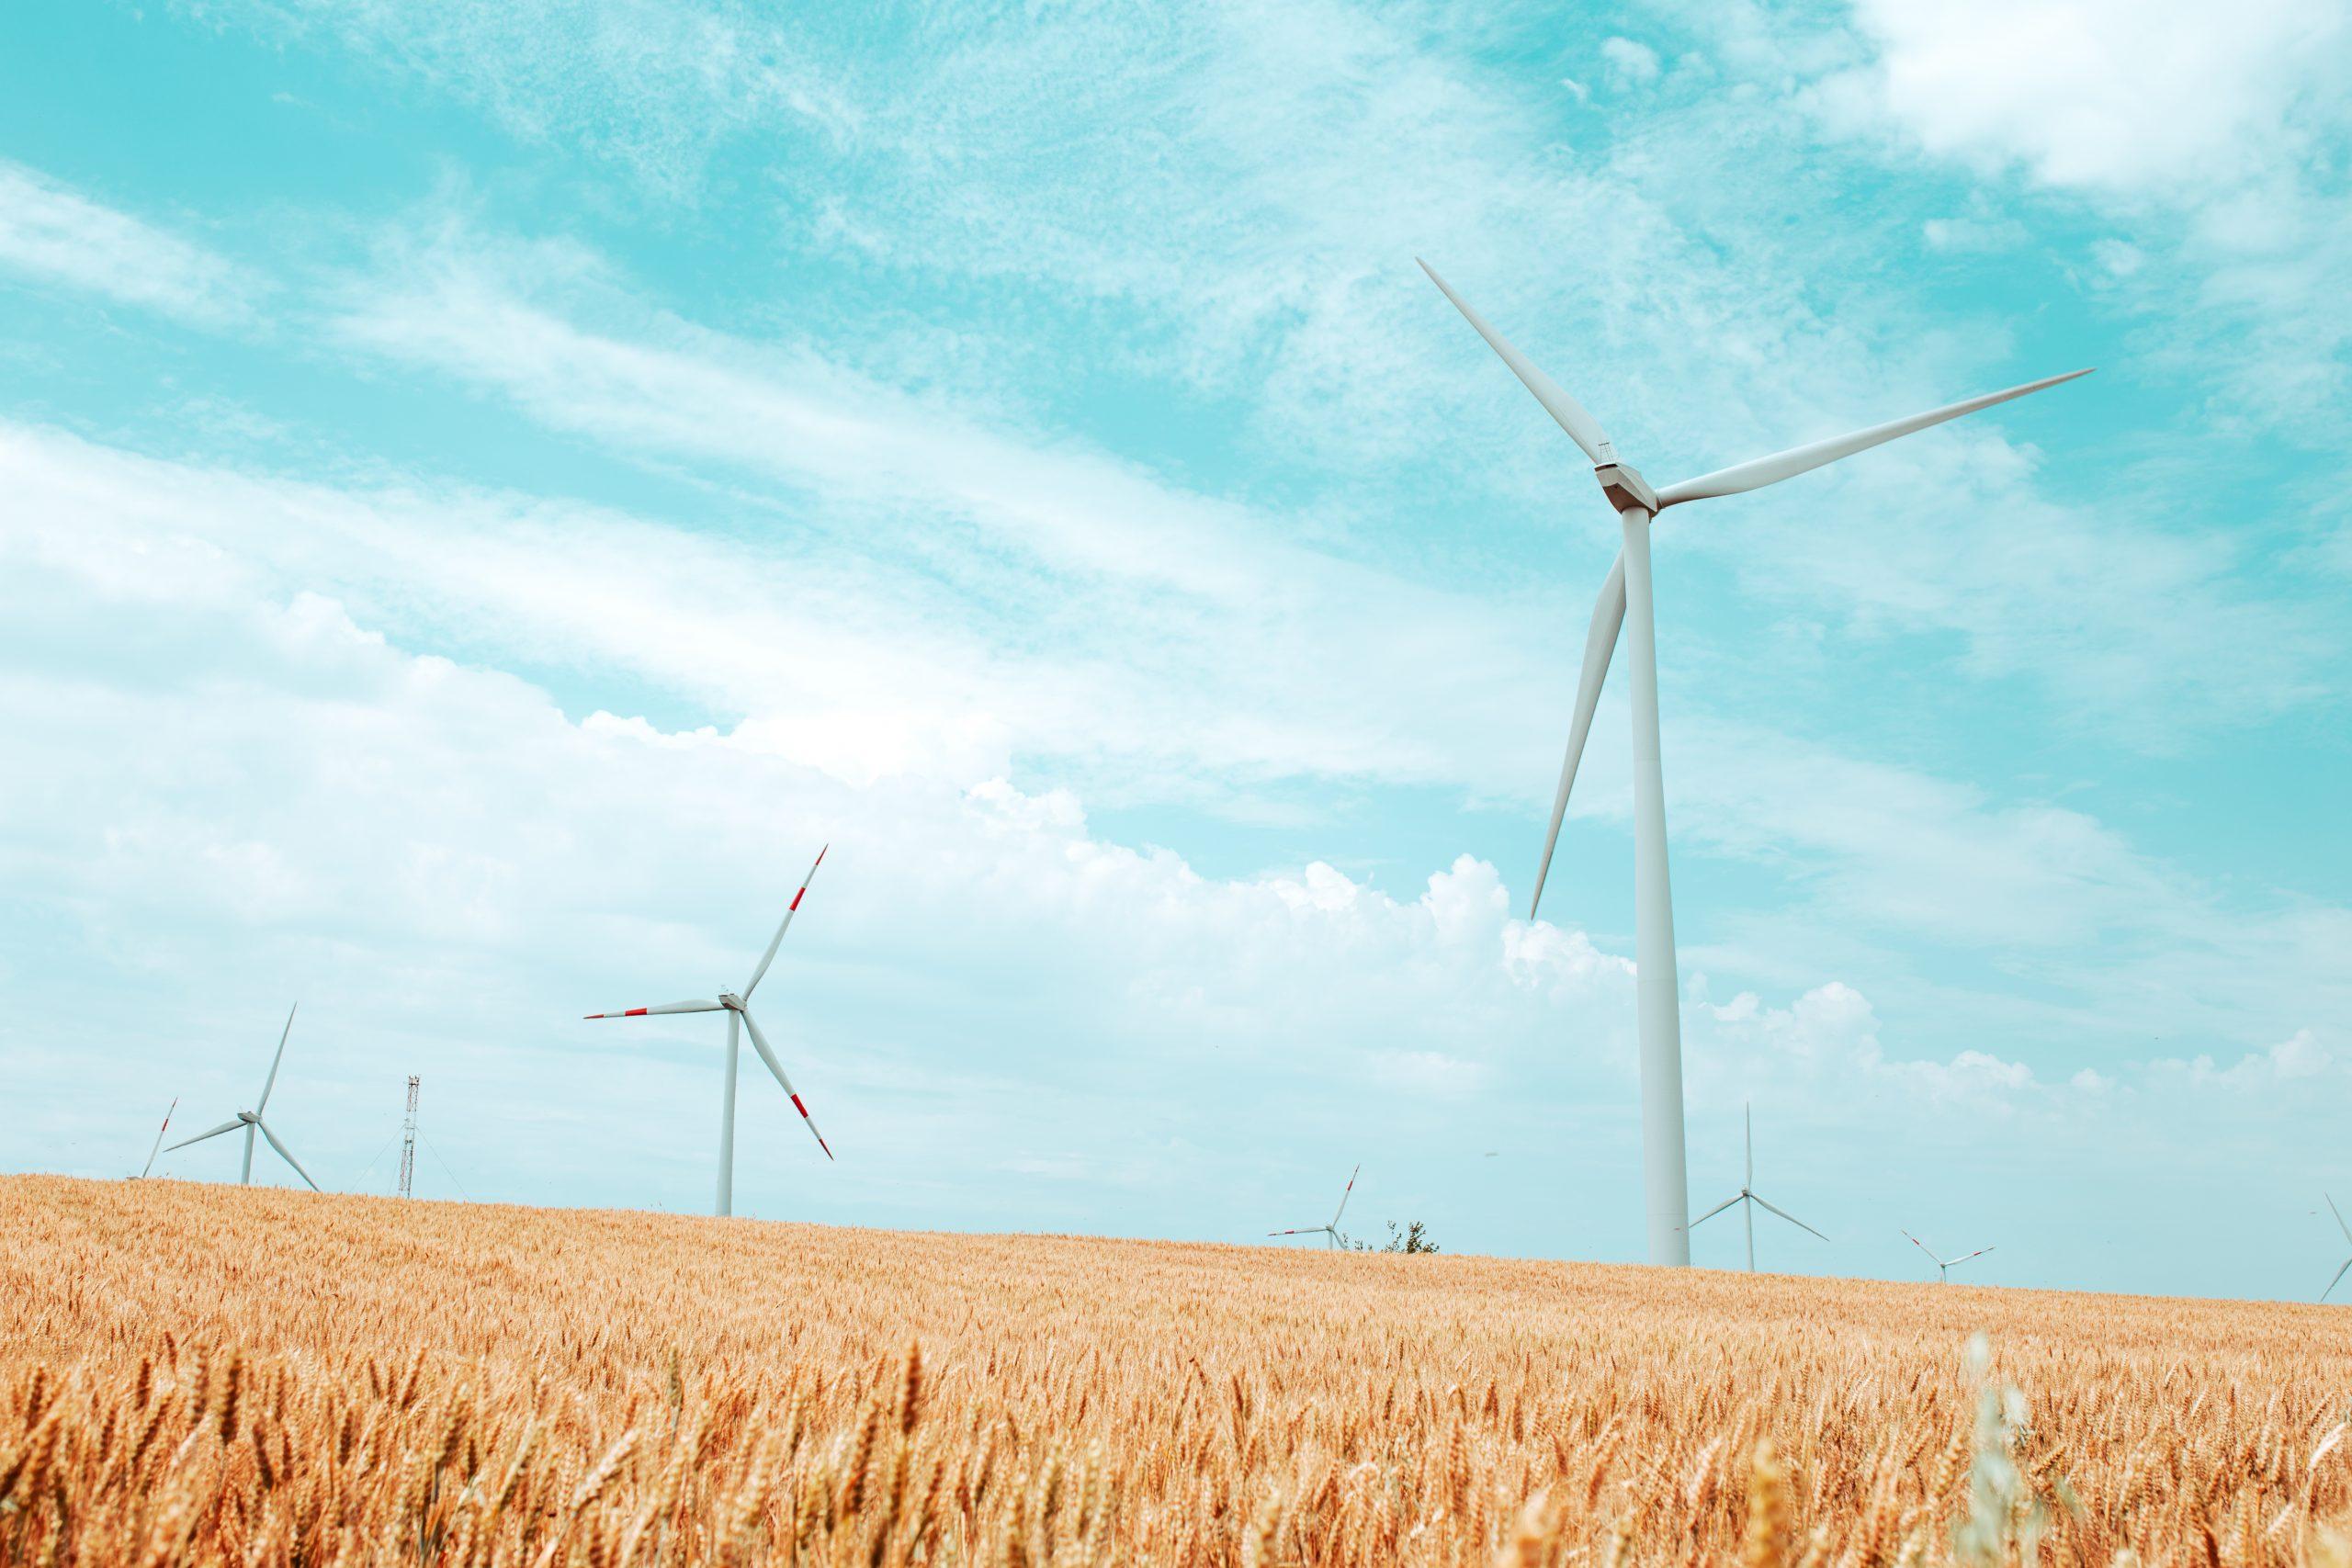 Windmill Farm in Cultivation Field